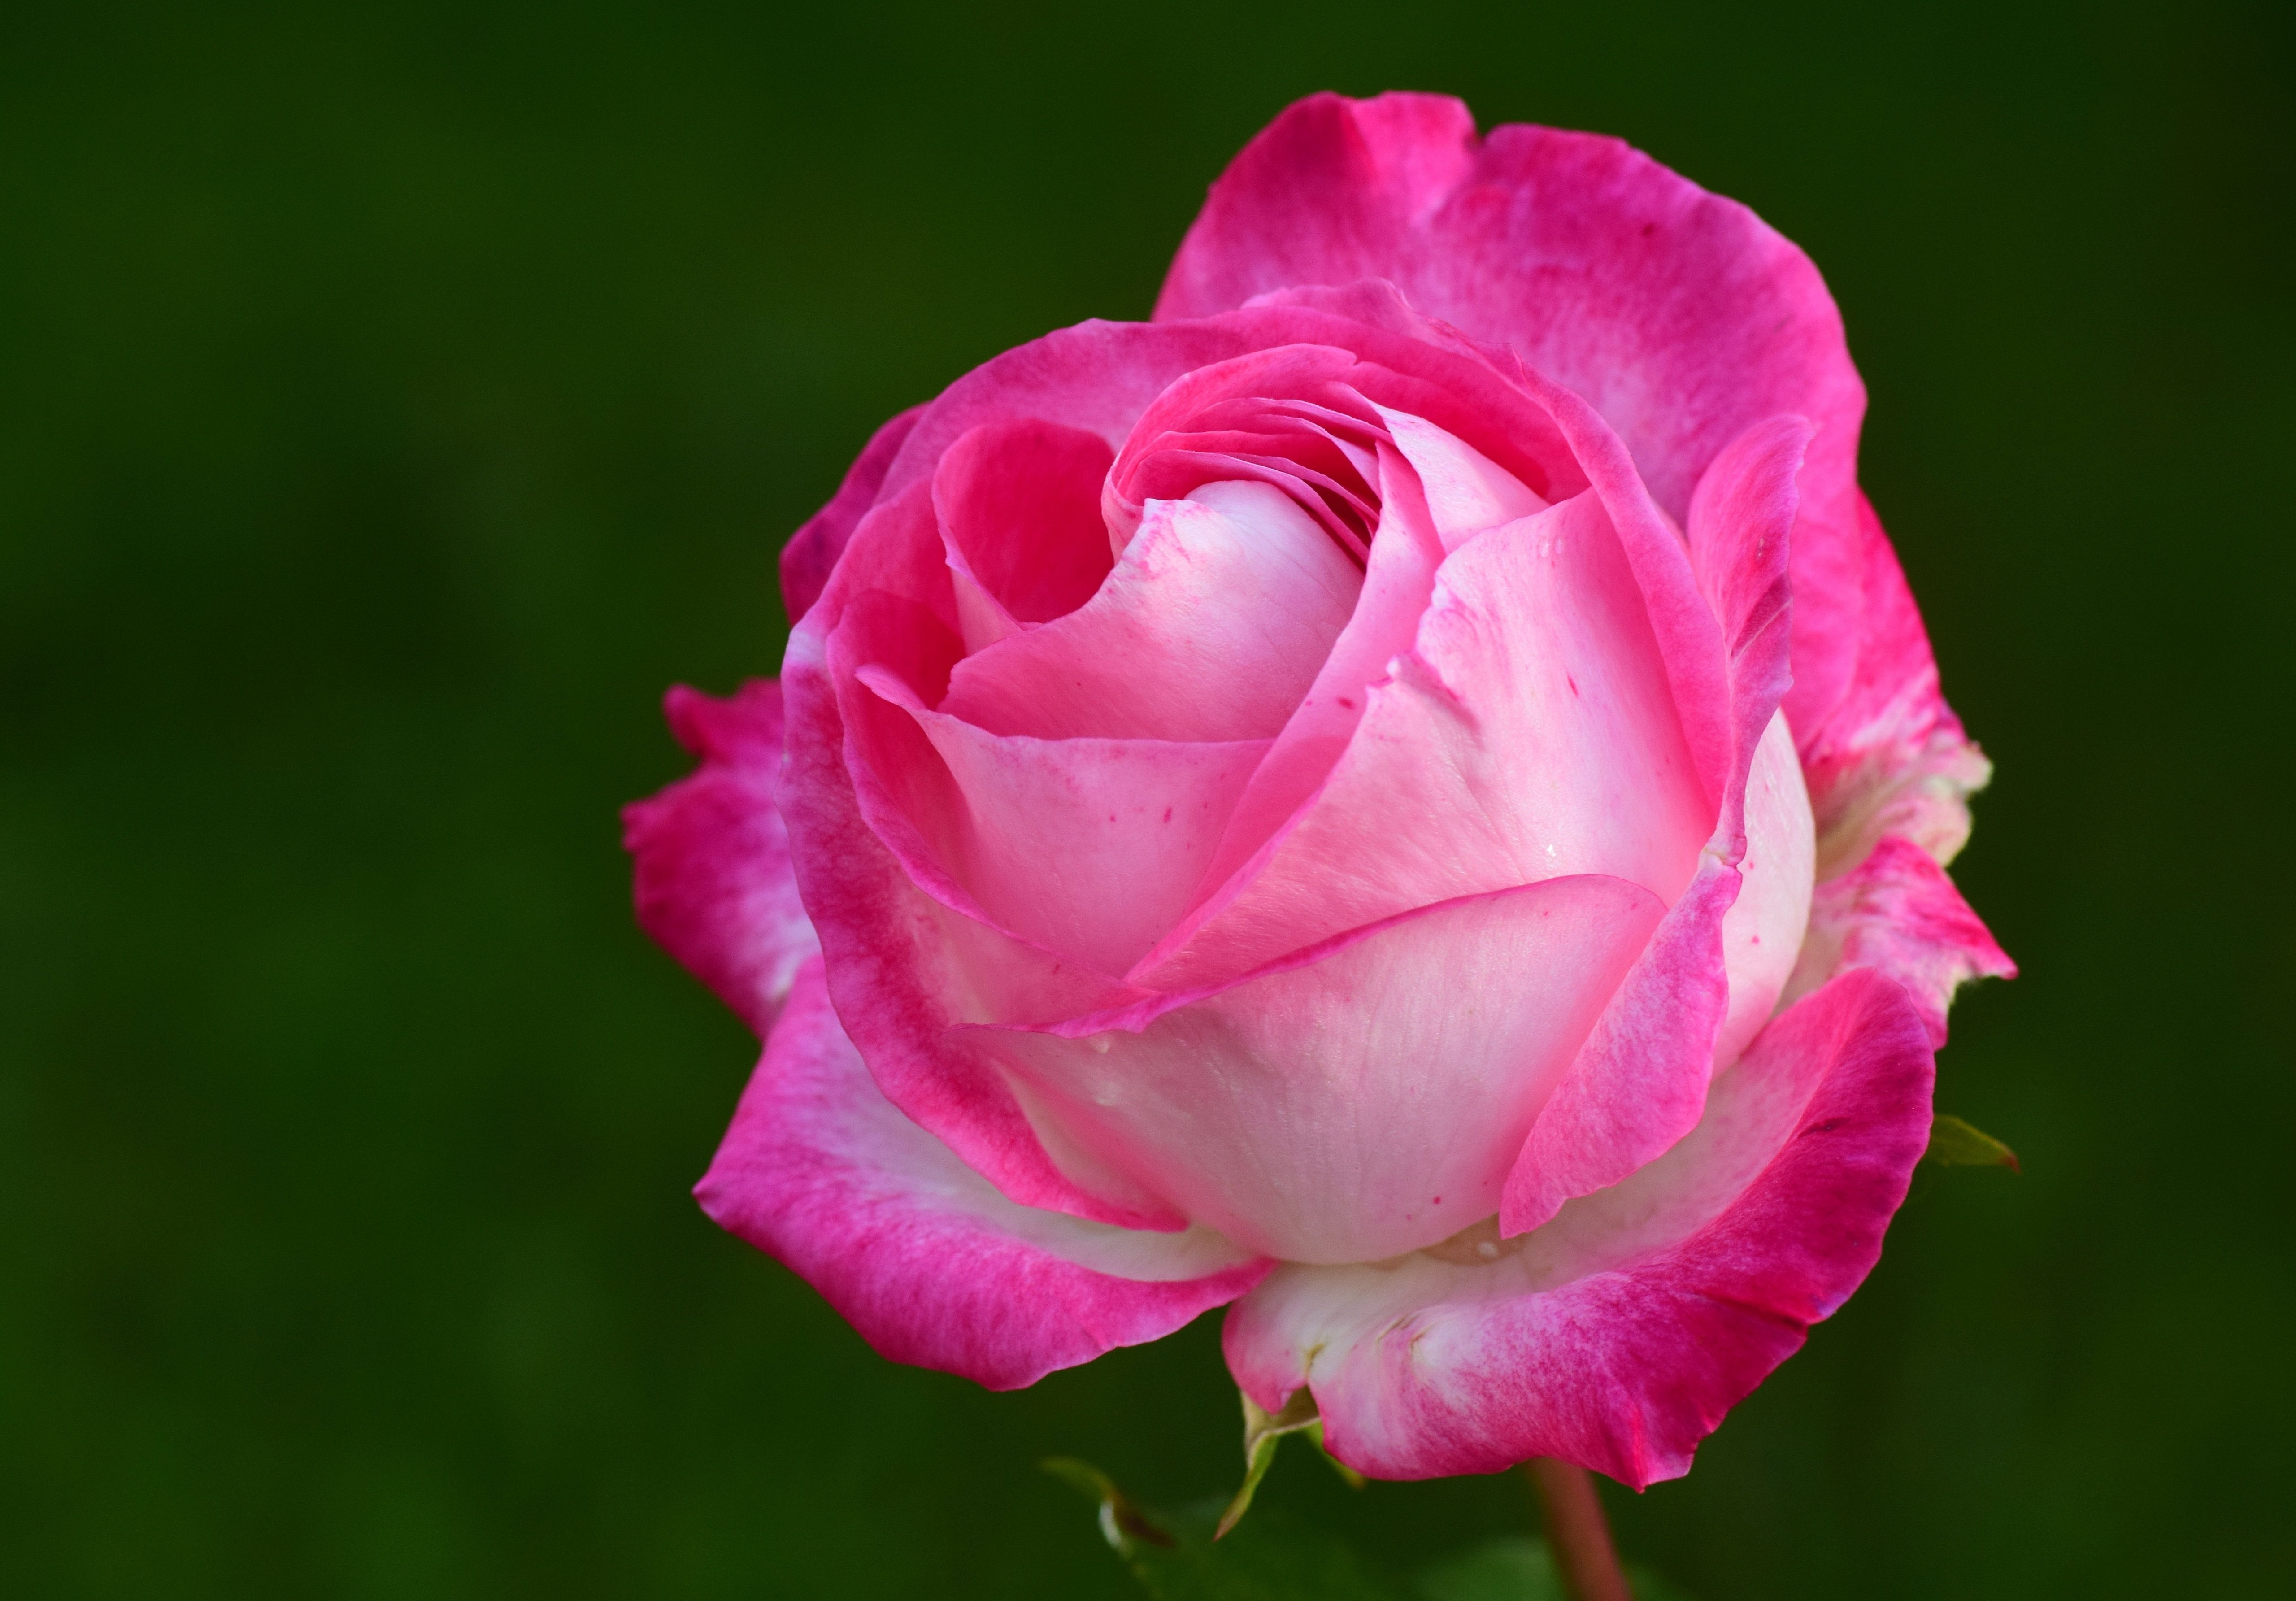 Pink Rose Beautiful Flowers Flower Desktop Wallpaper Rose Bloom